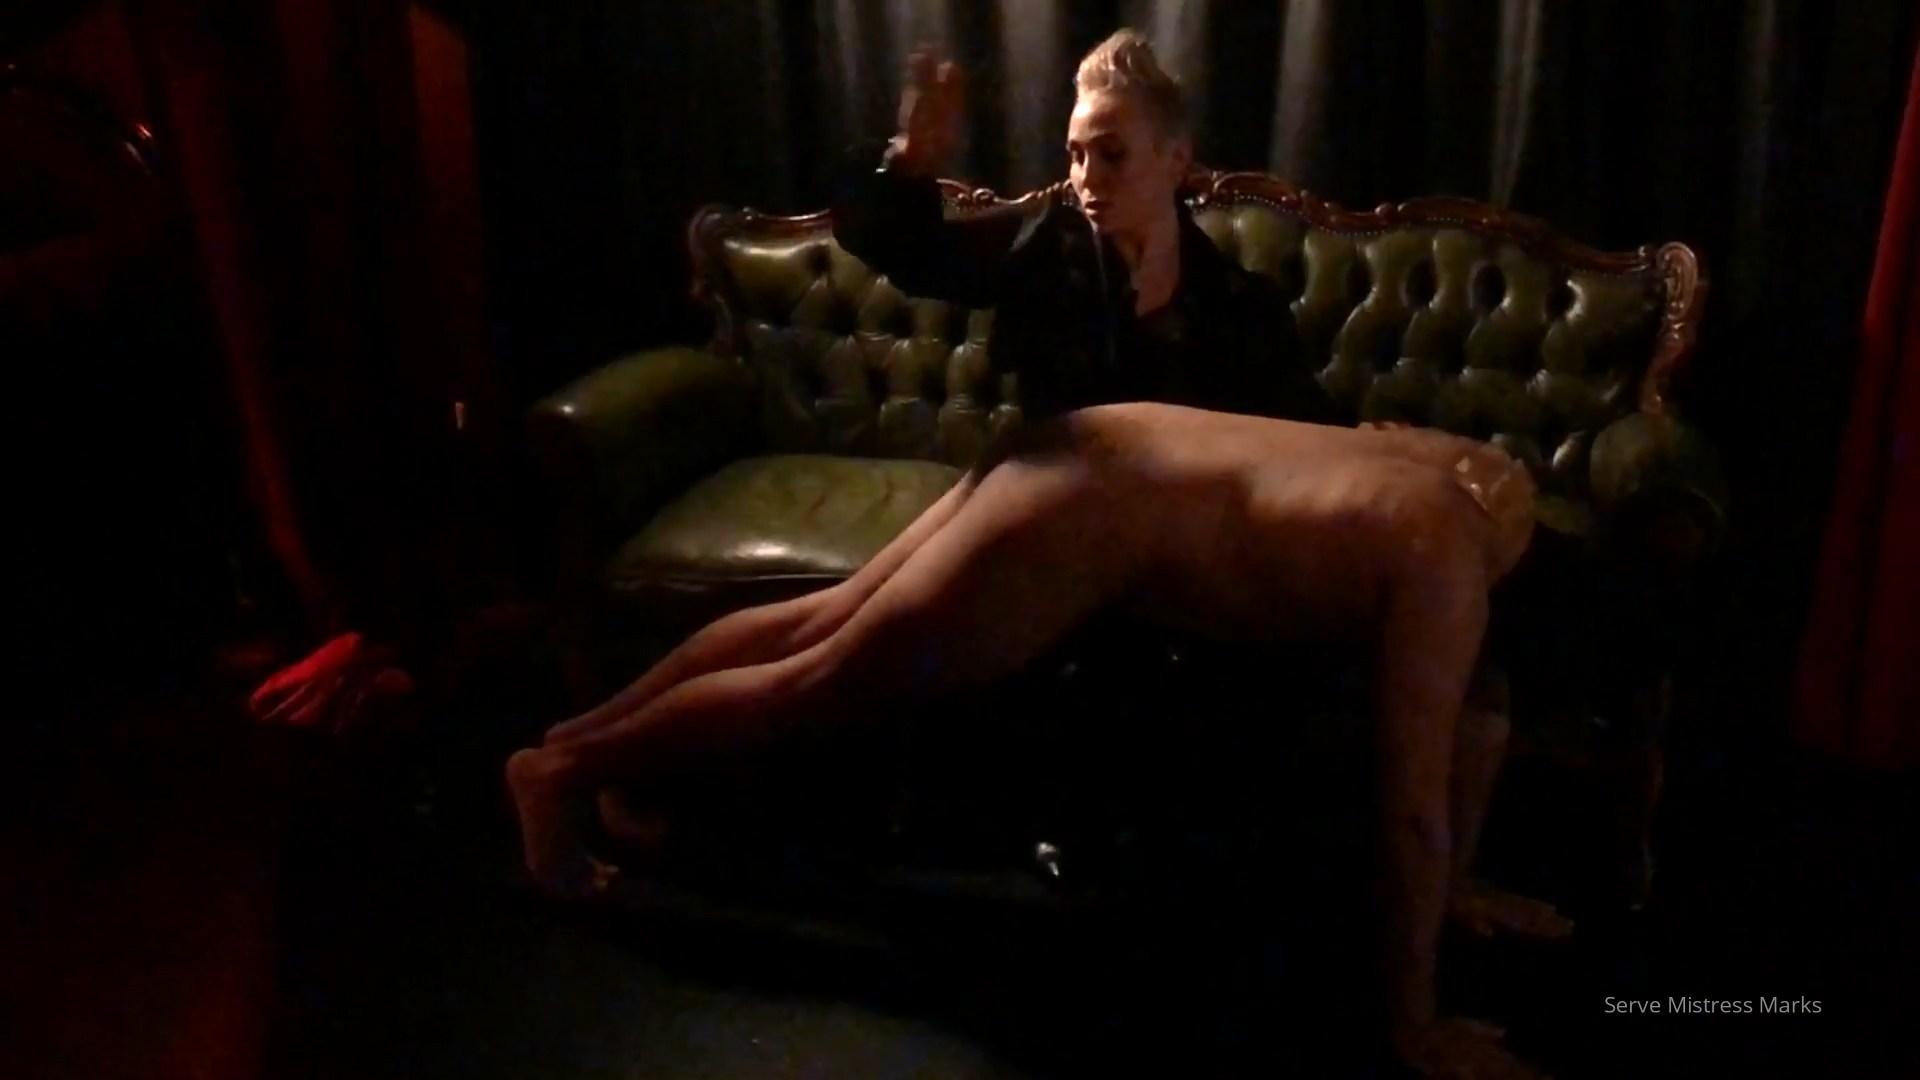 Miss Ruby Marks In Scene: A Short, Sweet Spanking - MISTRESS MARKS - FULL HD/1080p/MP4